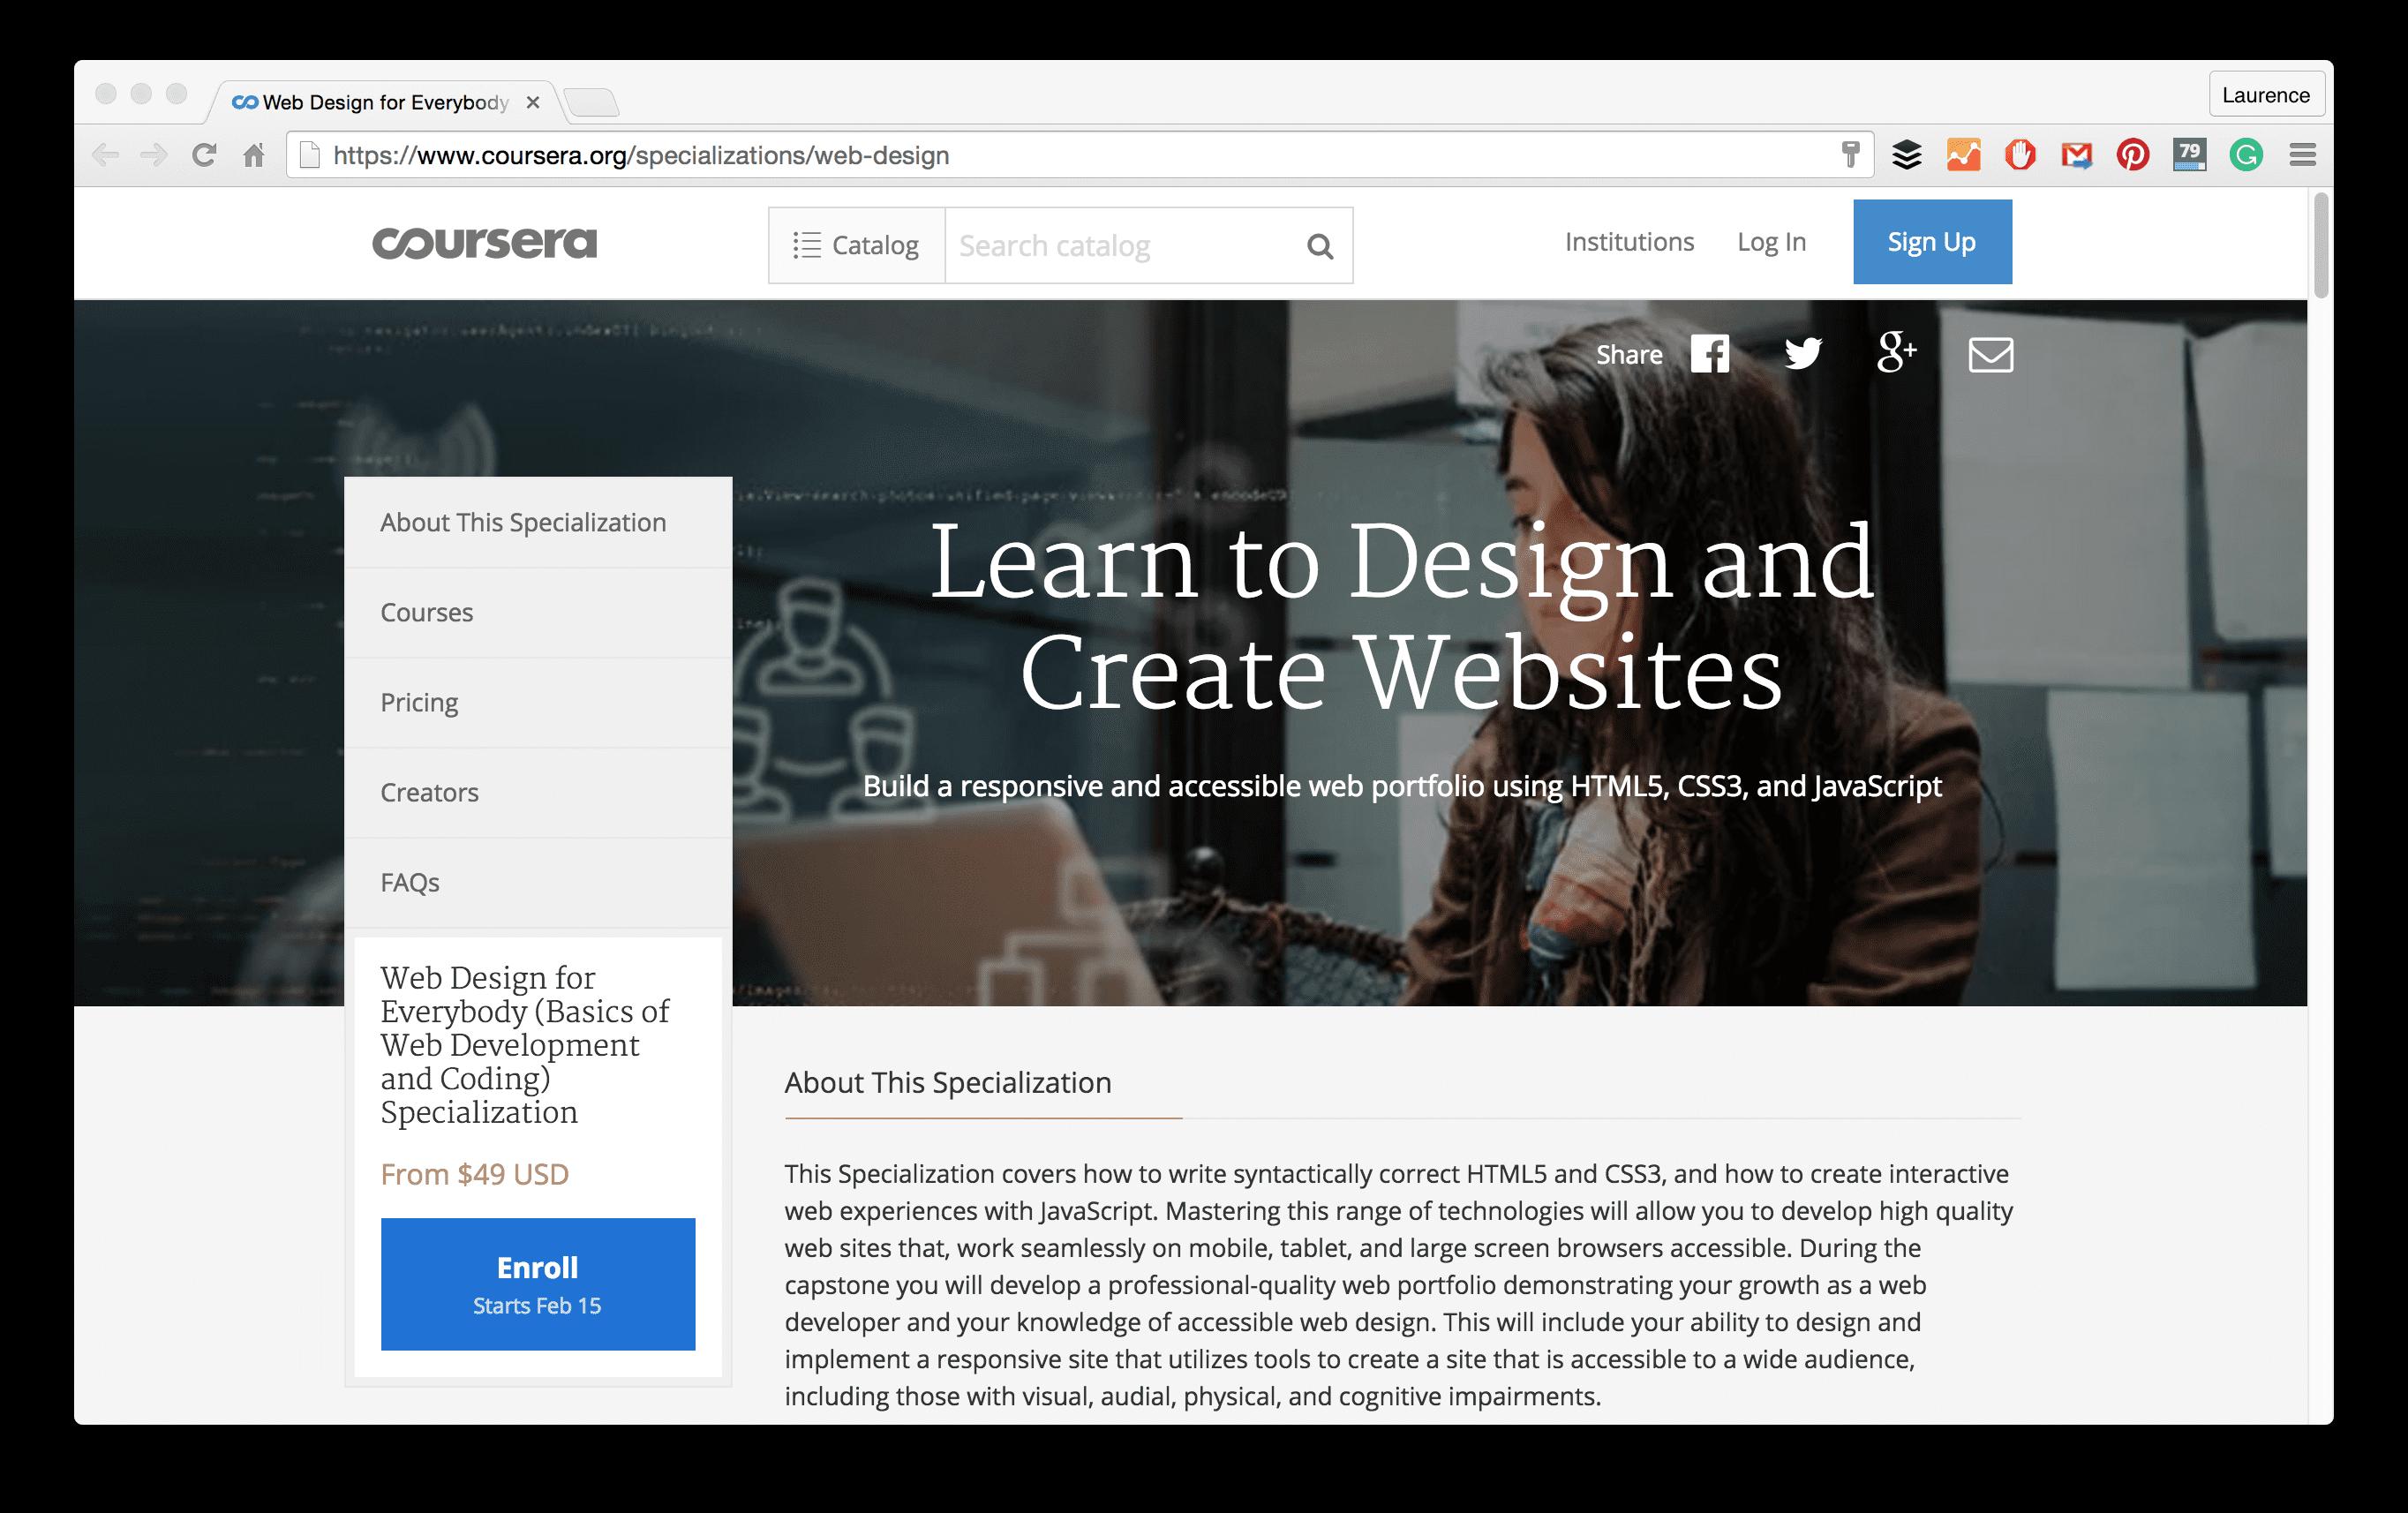 web design specialization